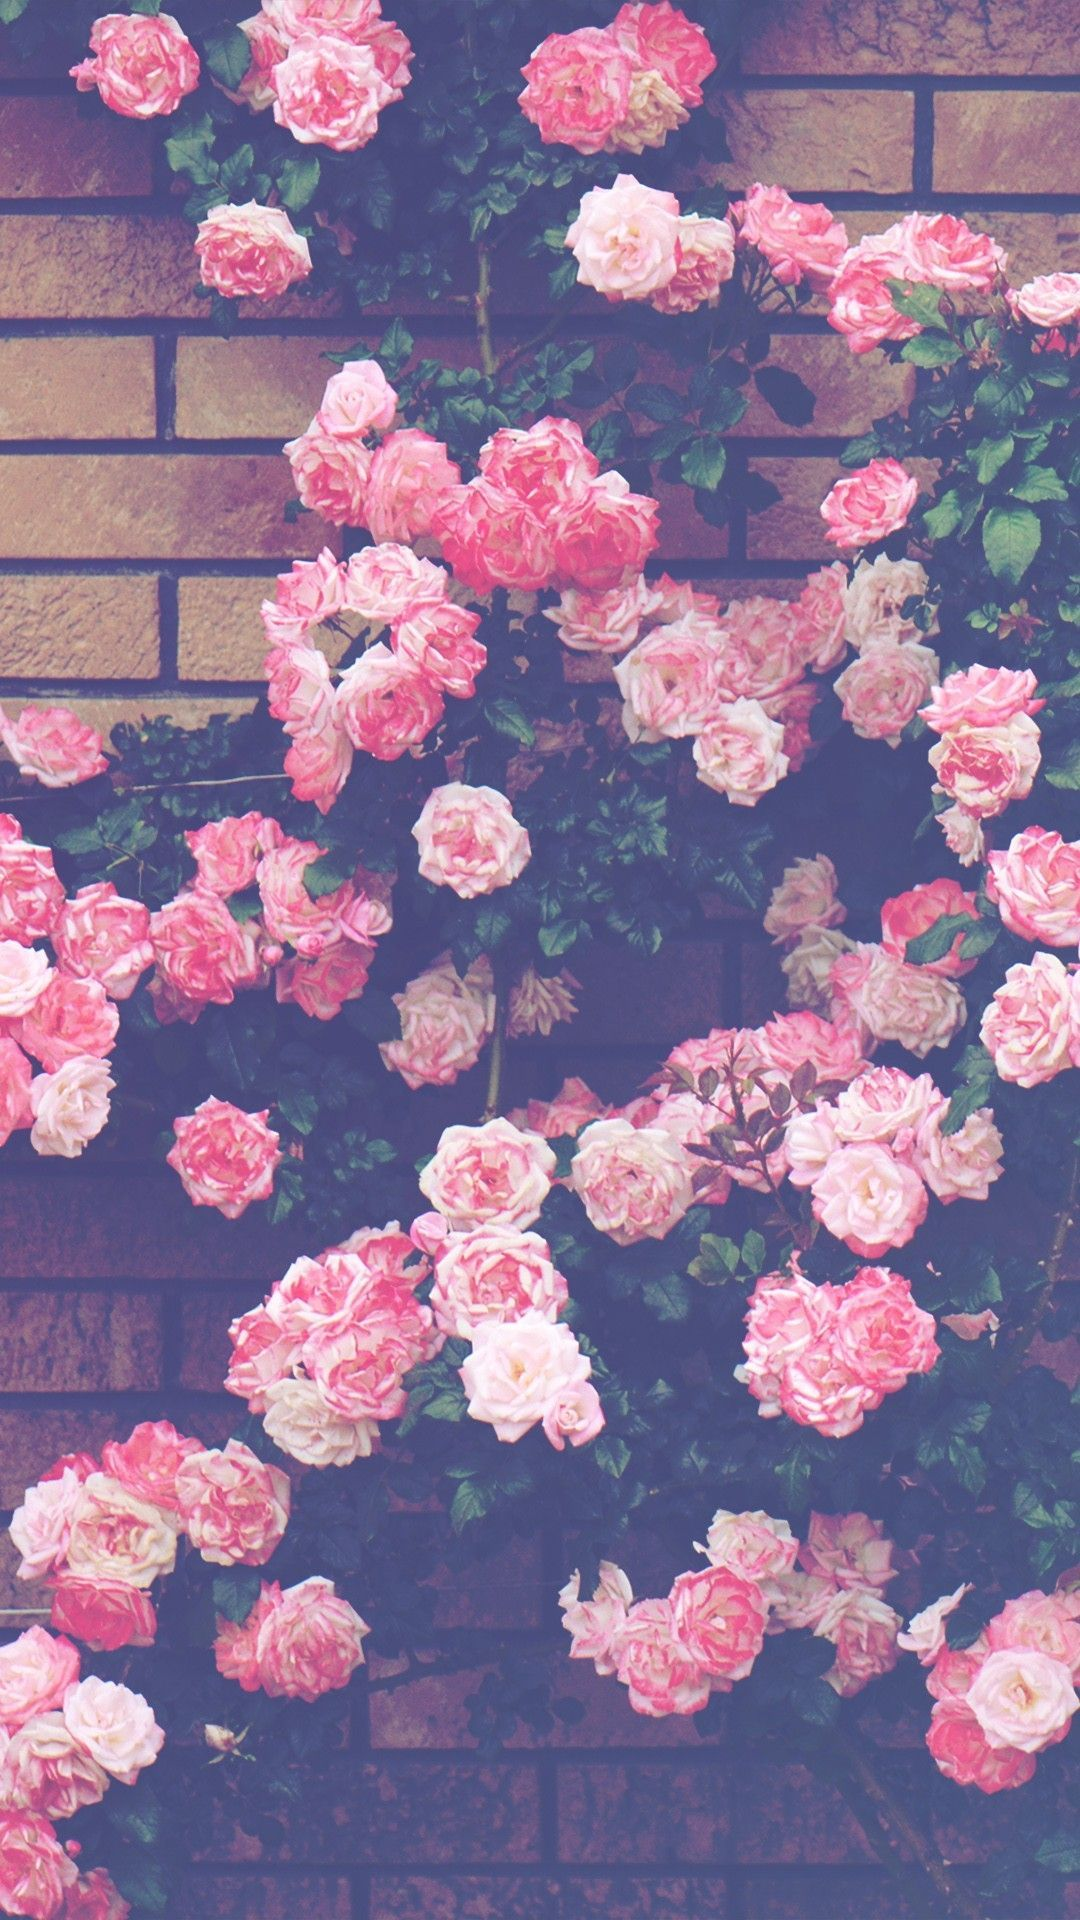 Download 3000 Wallpaper Bunga Pinterest HD Paling Keren